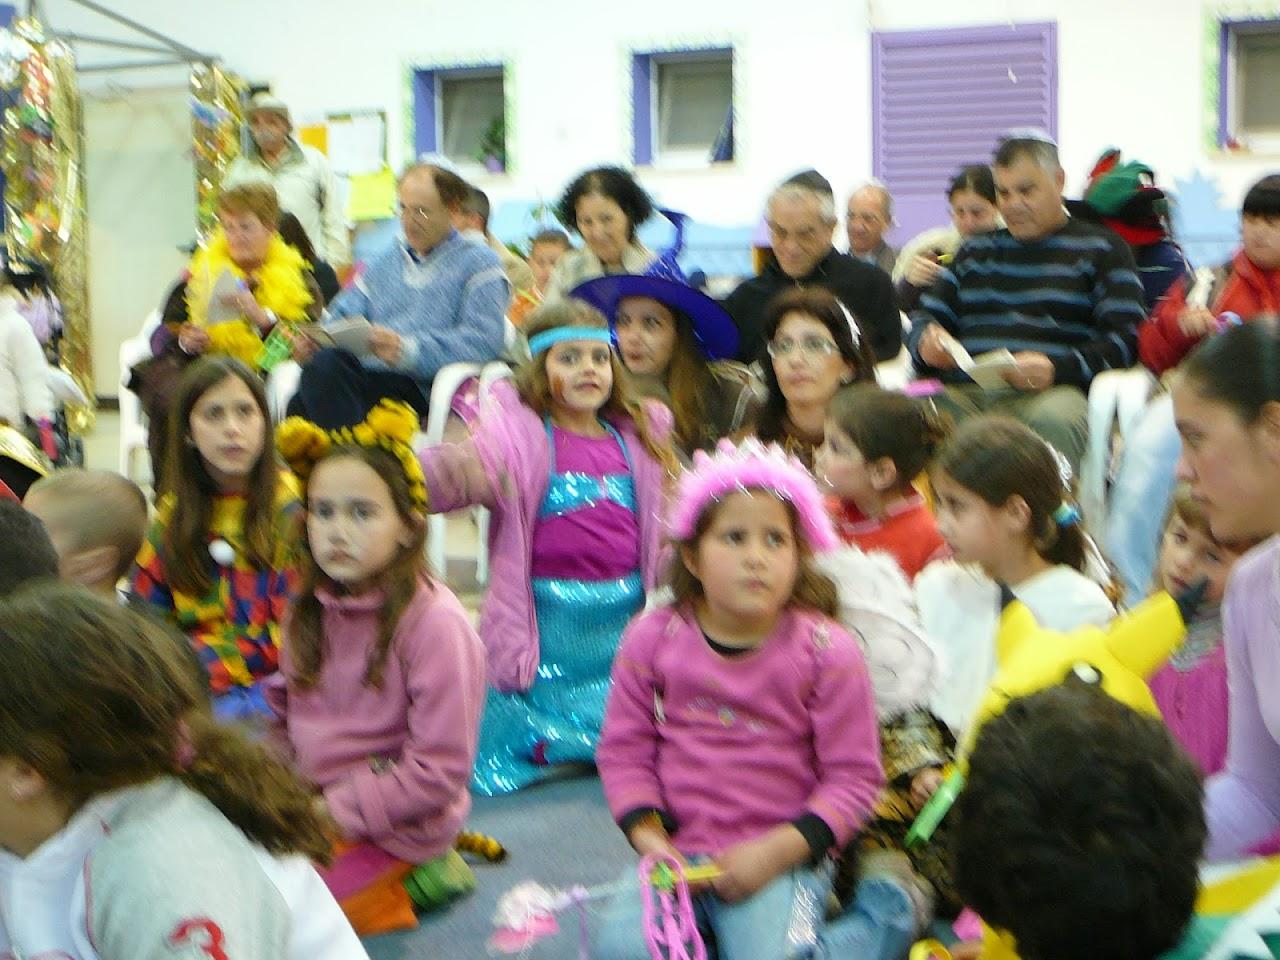 Purim 2007  - 2007-03-03 12.45.22.jpg